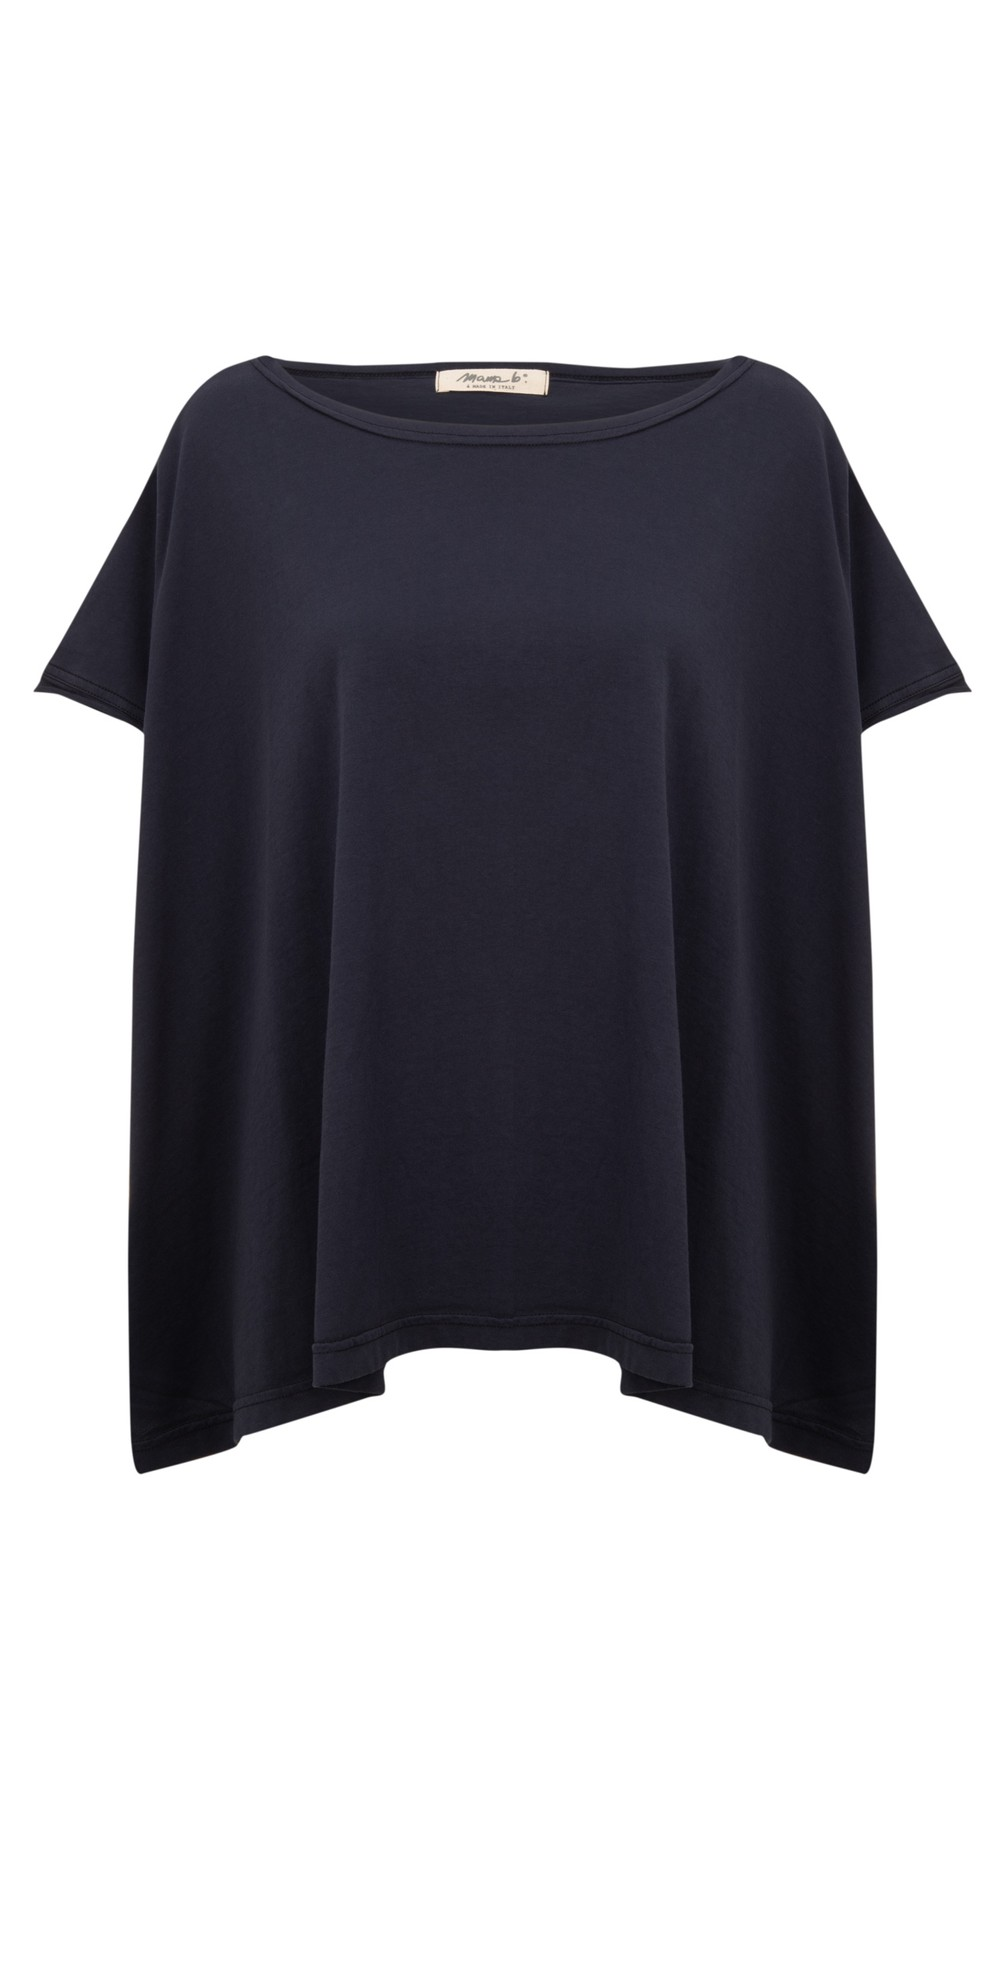 Greco U T-Shirt main image